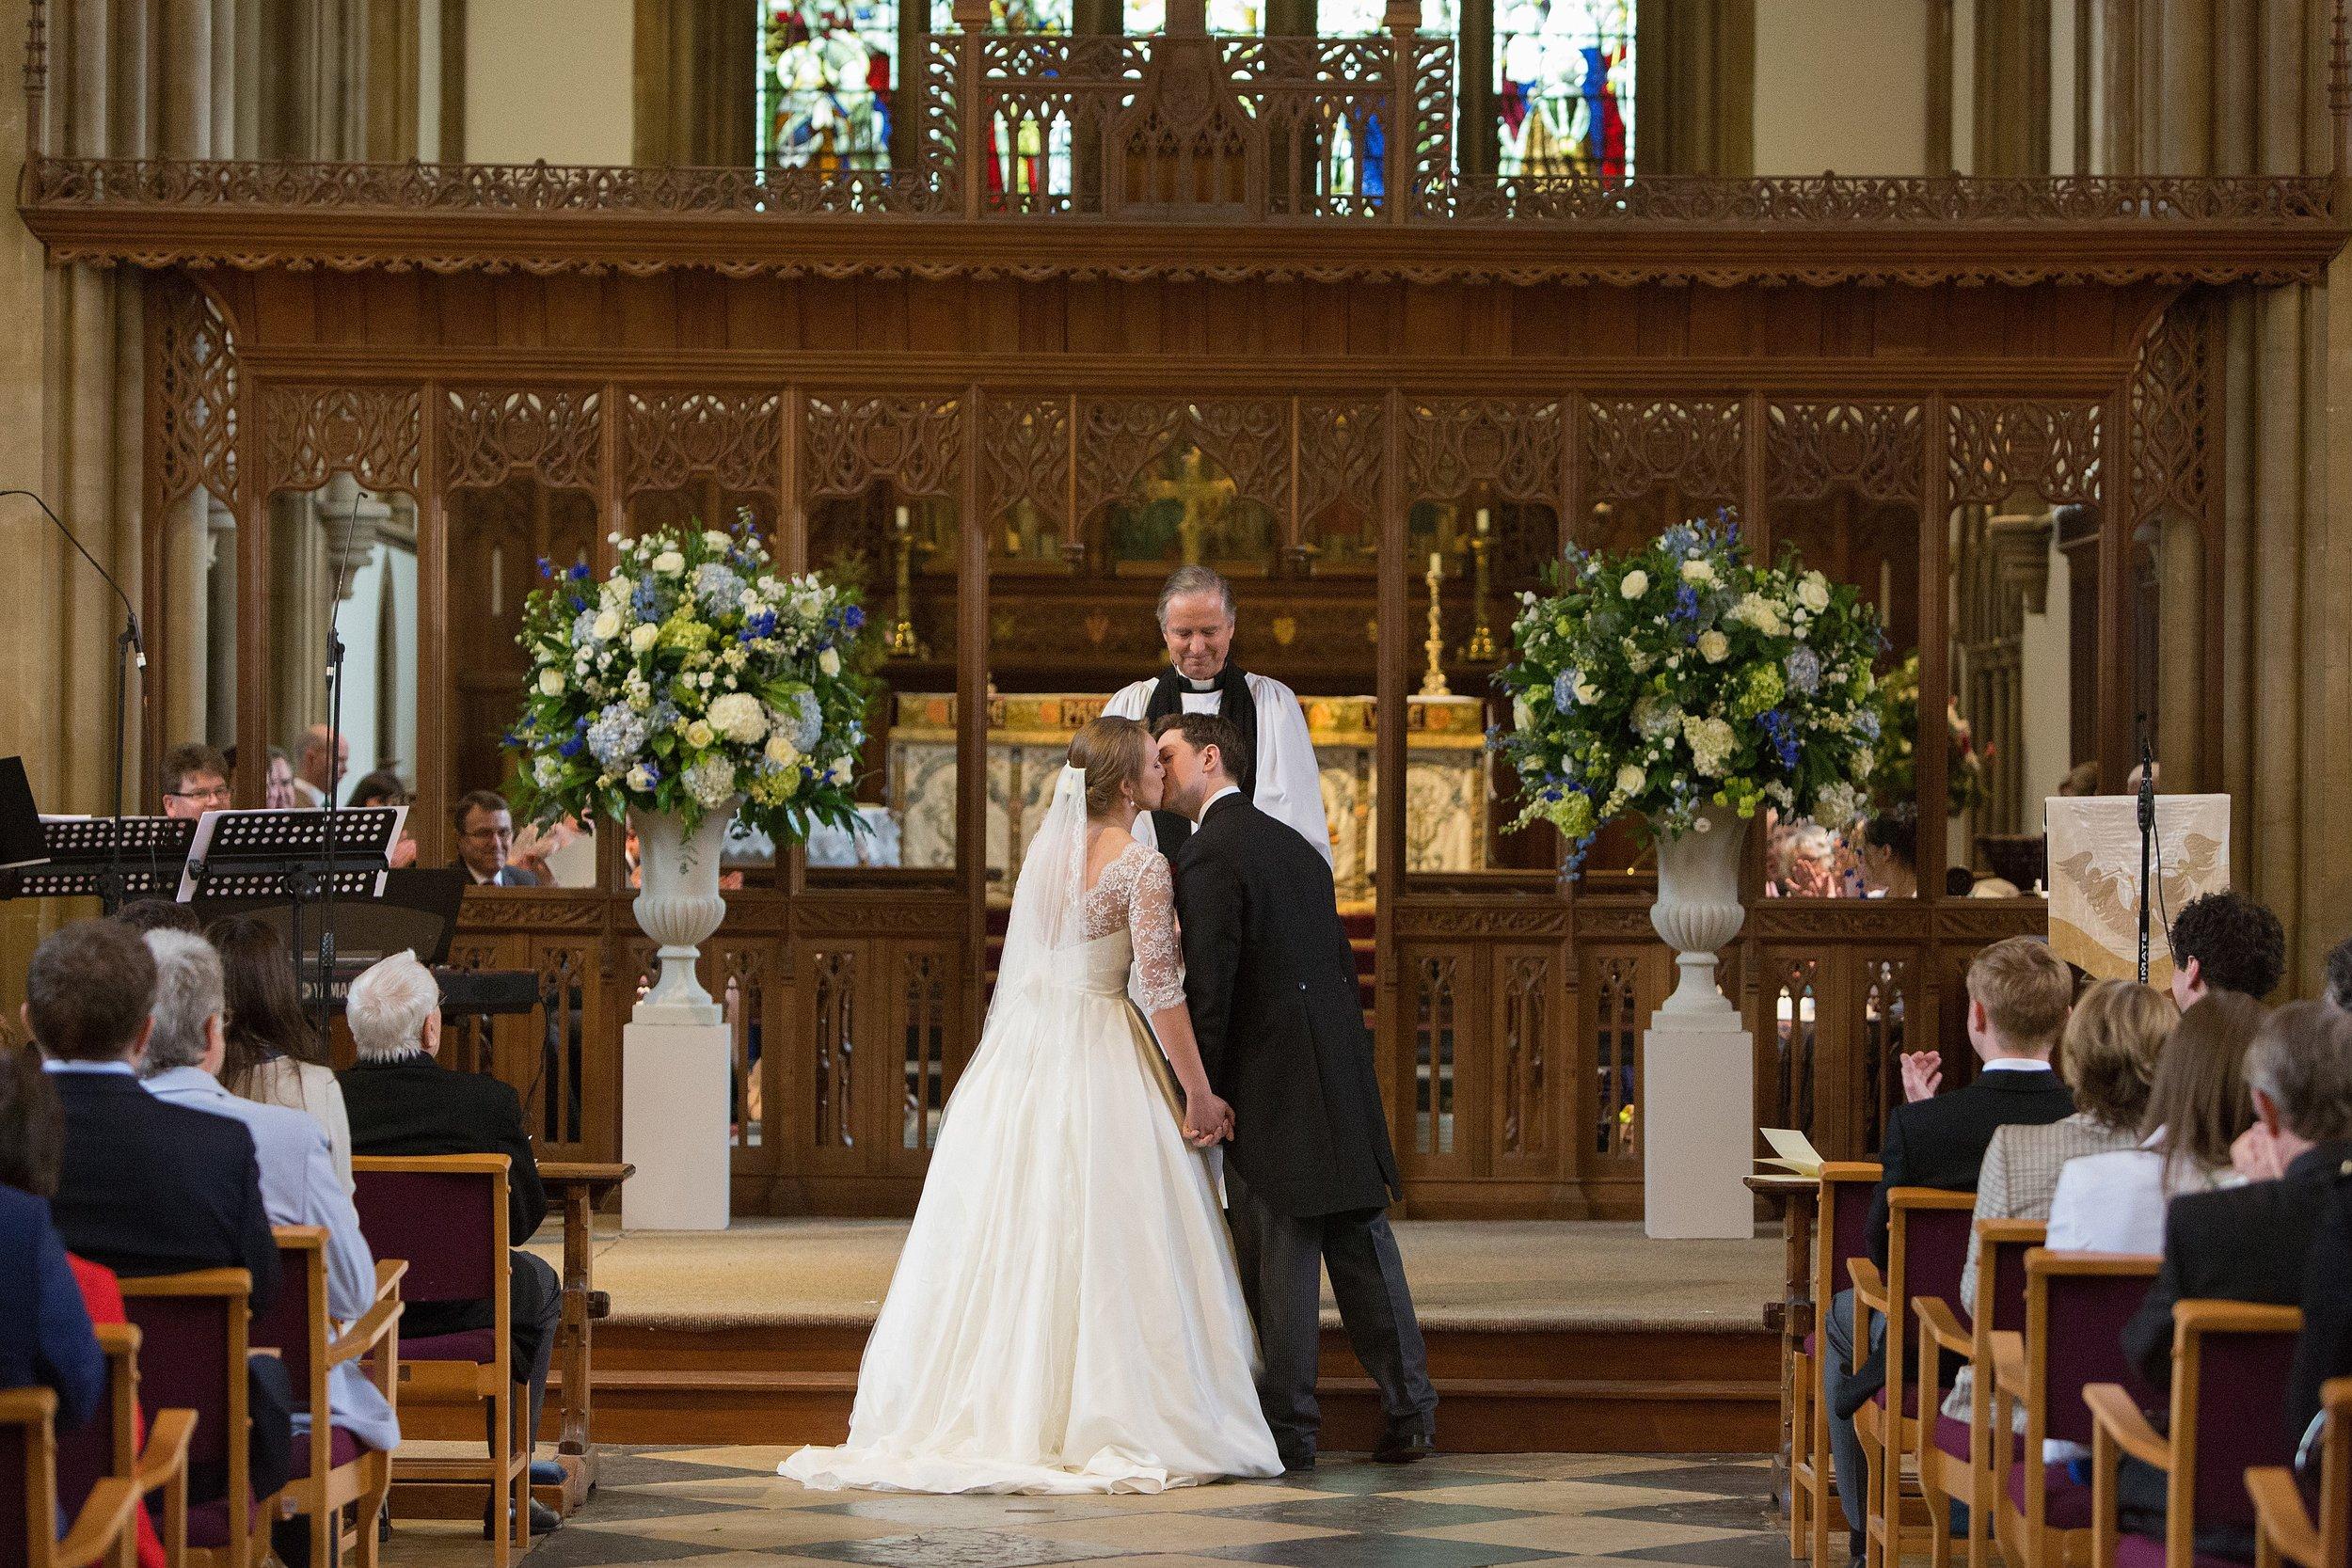 MIRIAM_FAITH_WEDDING_FLOWERS_CEREMONY_URN_CHURCH_PEDESTAL_BLUE_WHITE_GREEN_CEREMONY.JPG